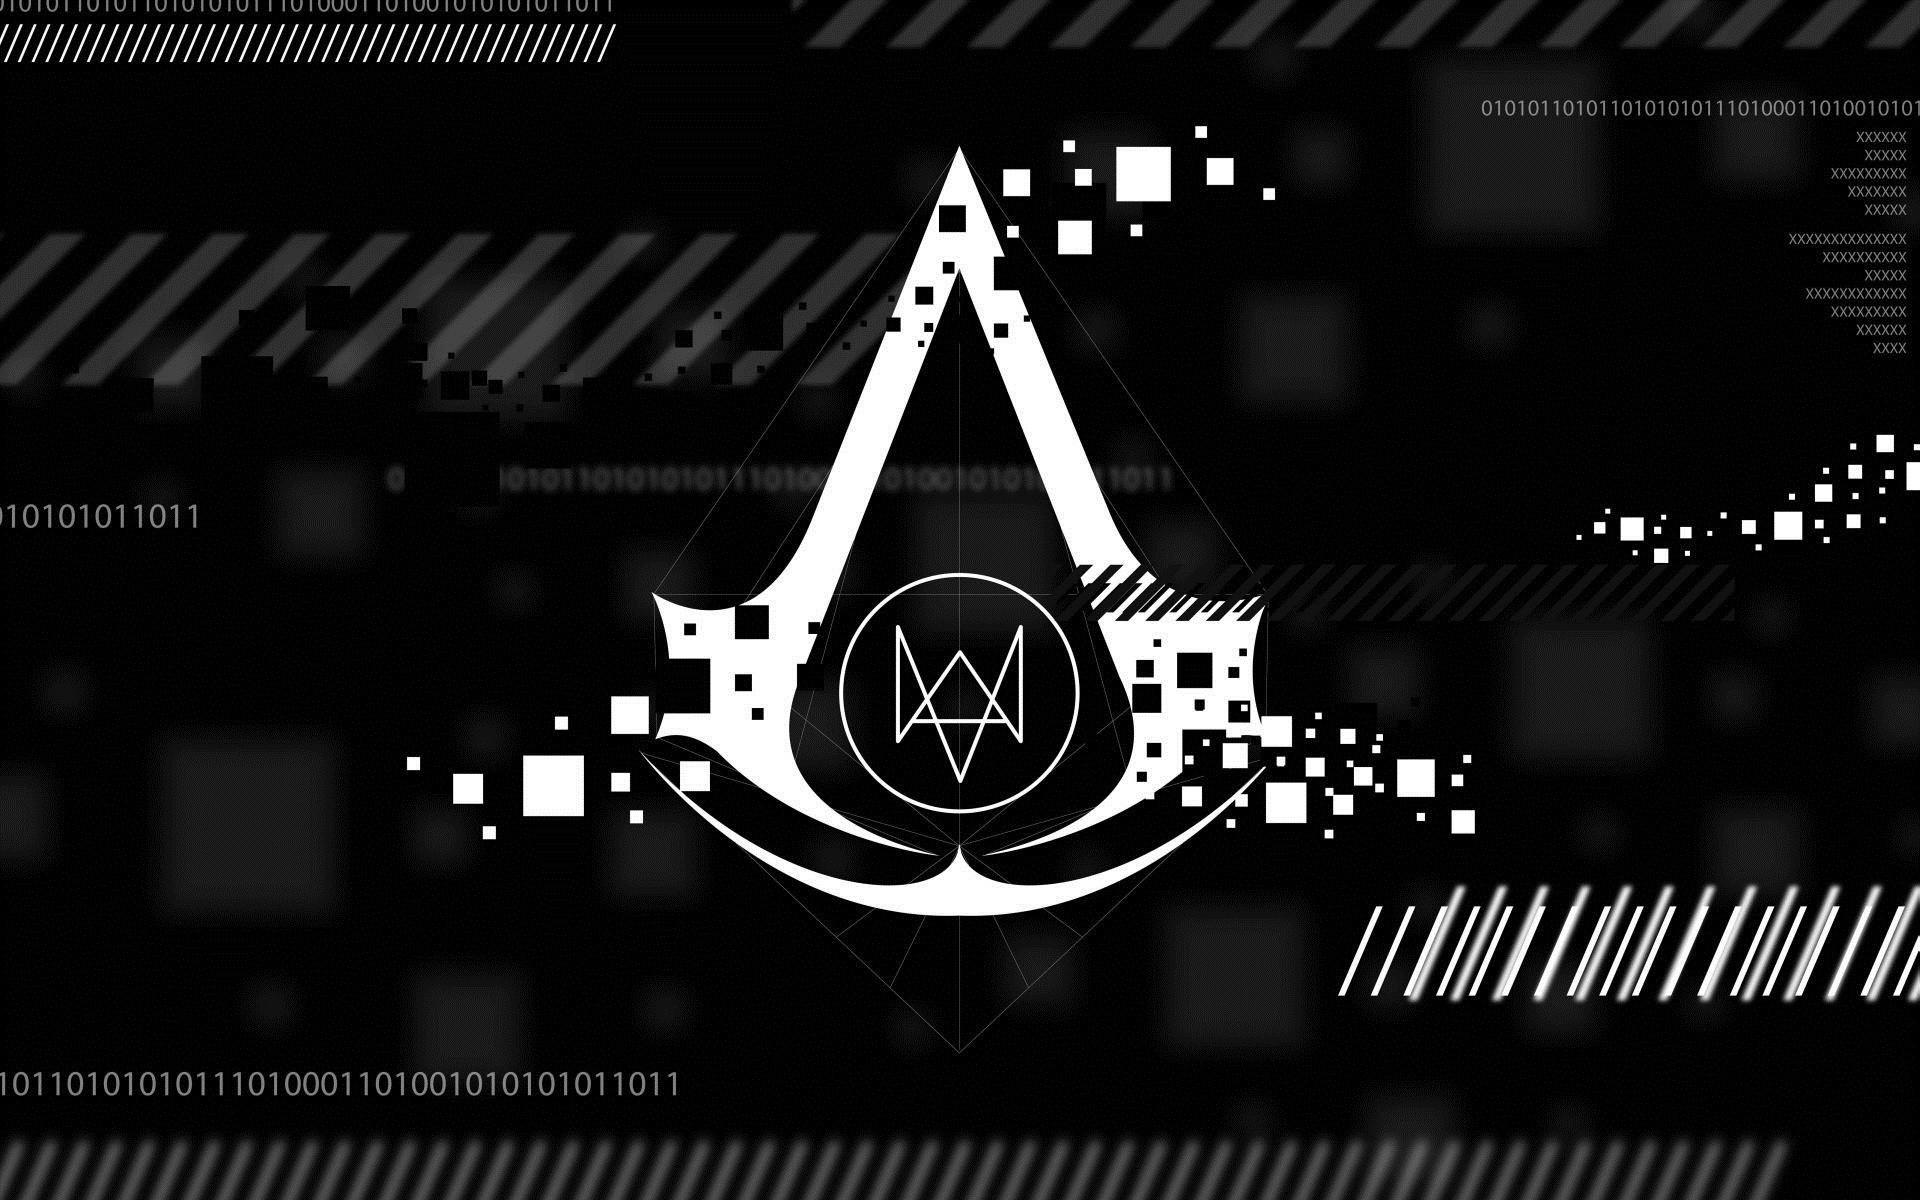 Assassin's Creed logo HD wallpaper 1